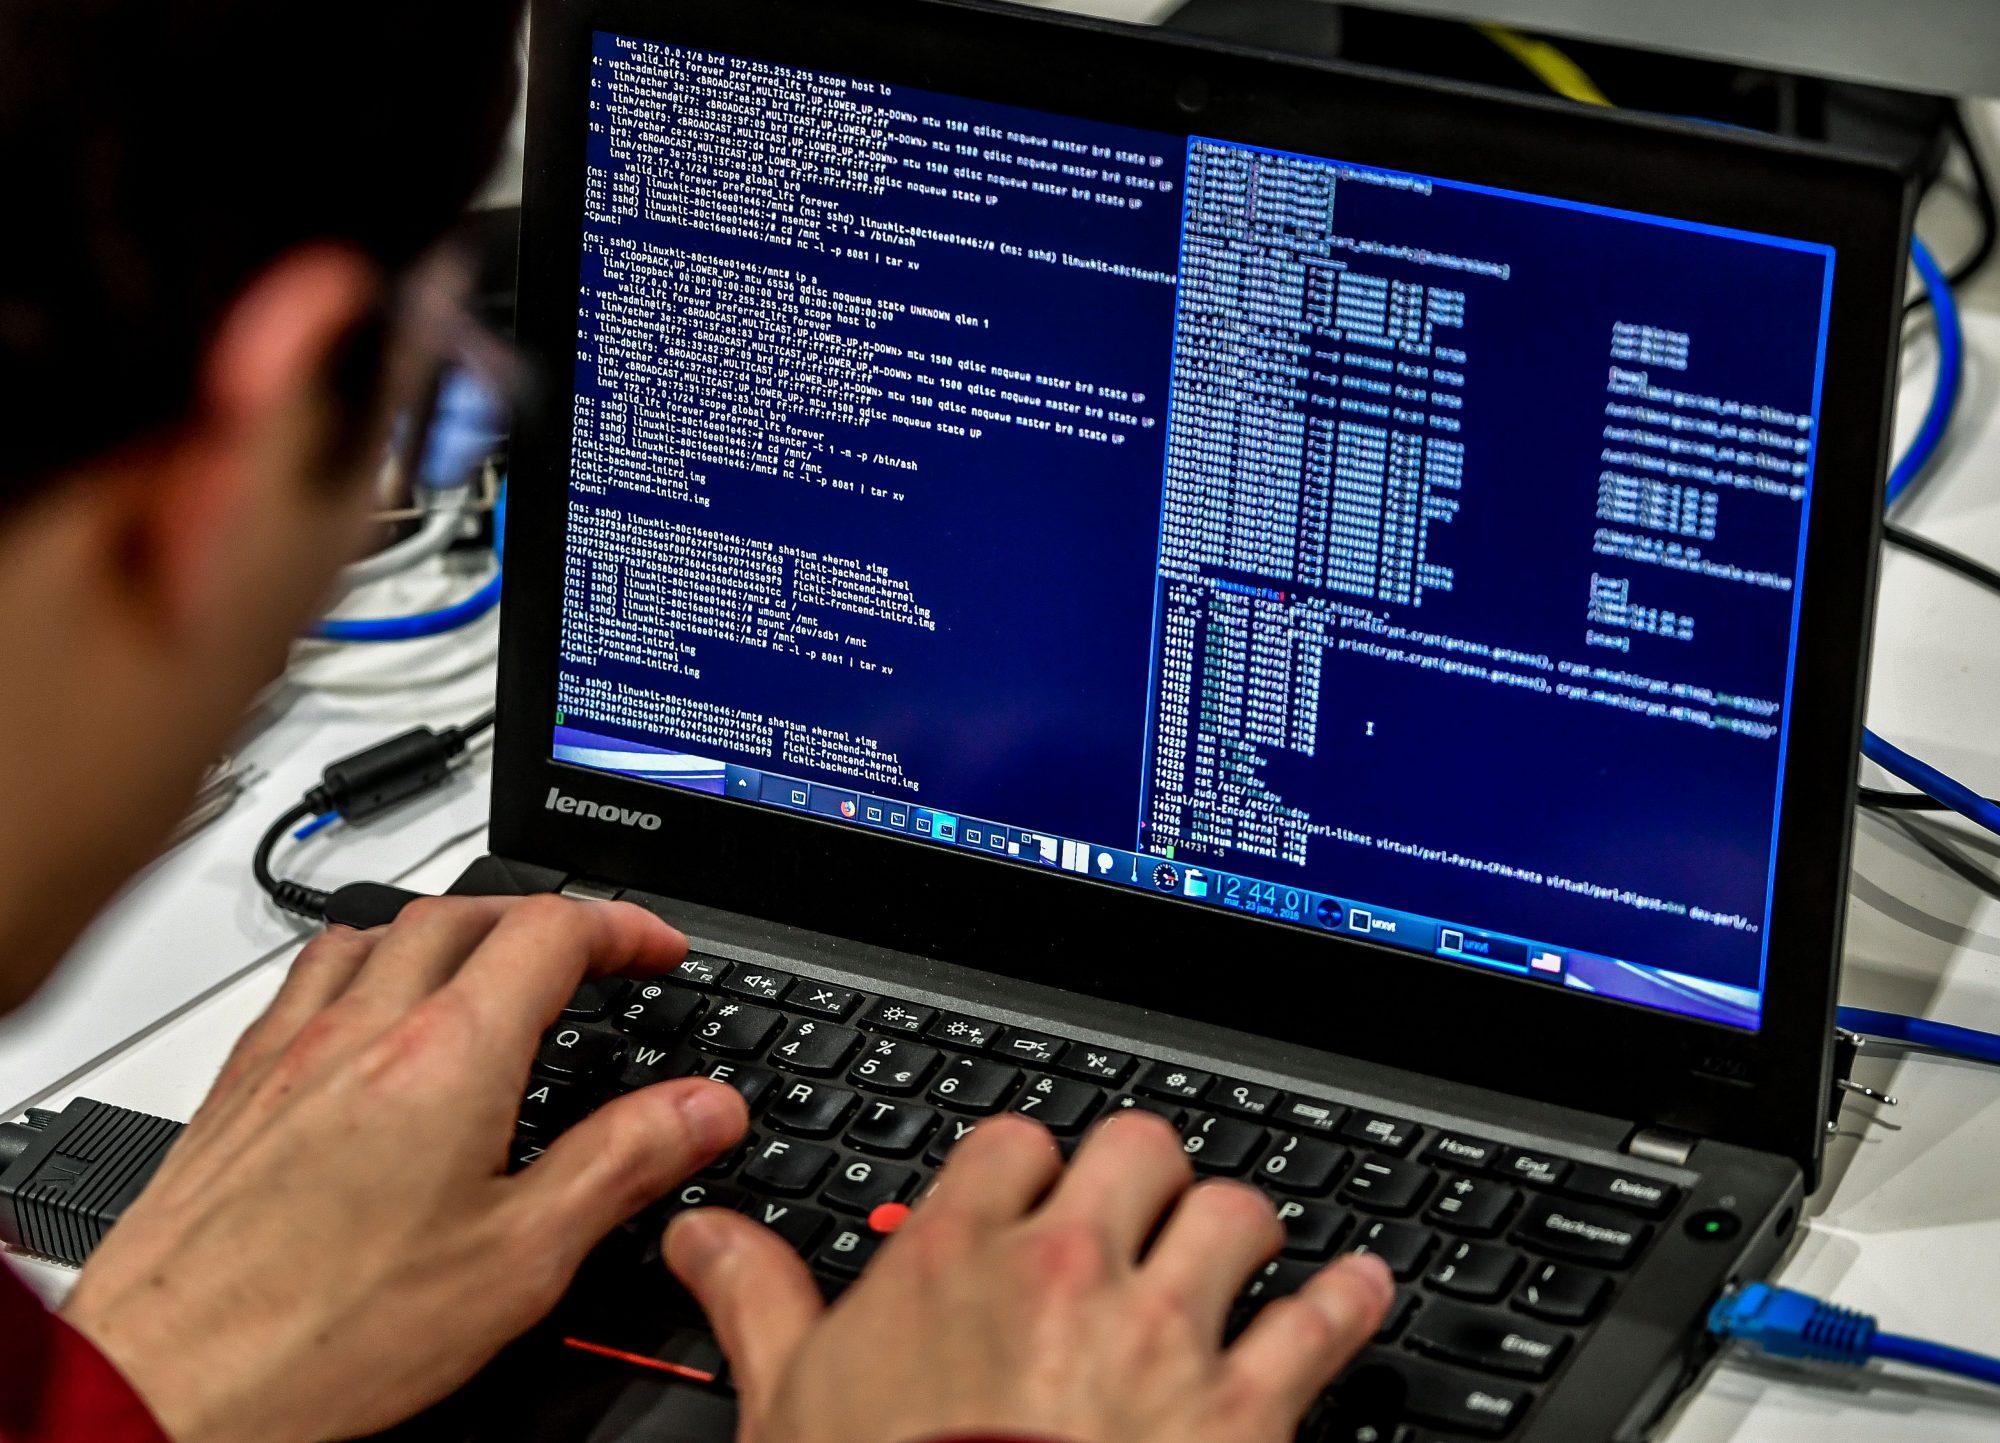 Computadoras, ataque cibernético